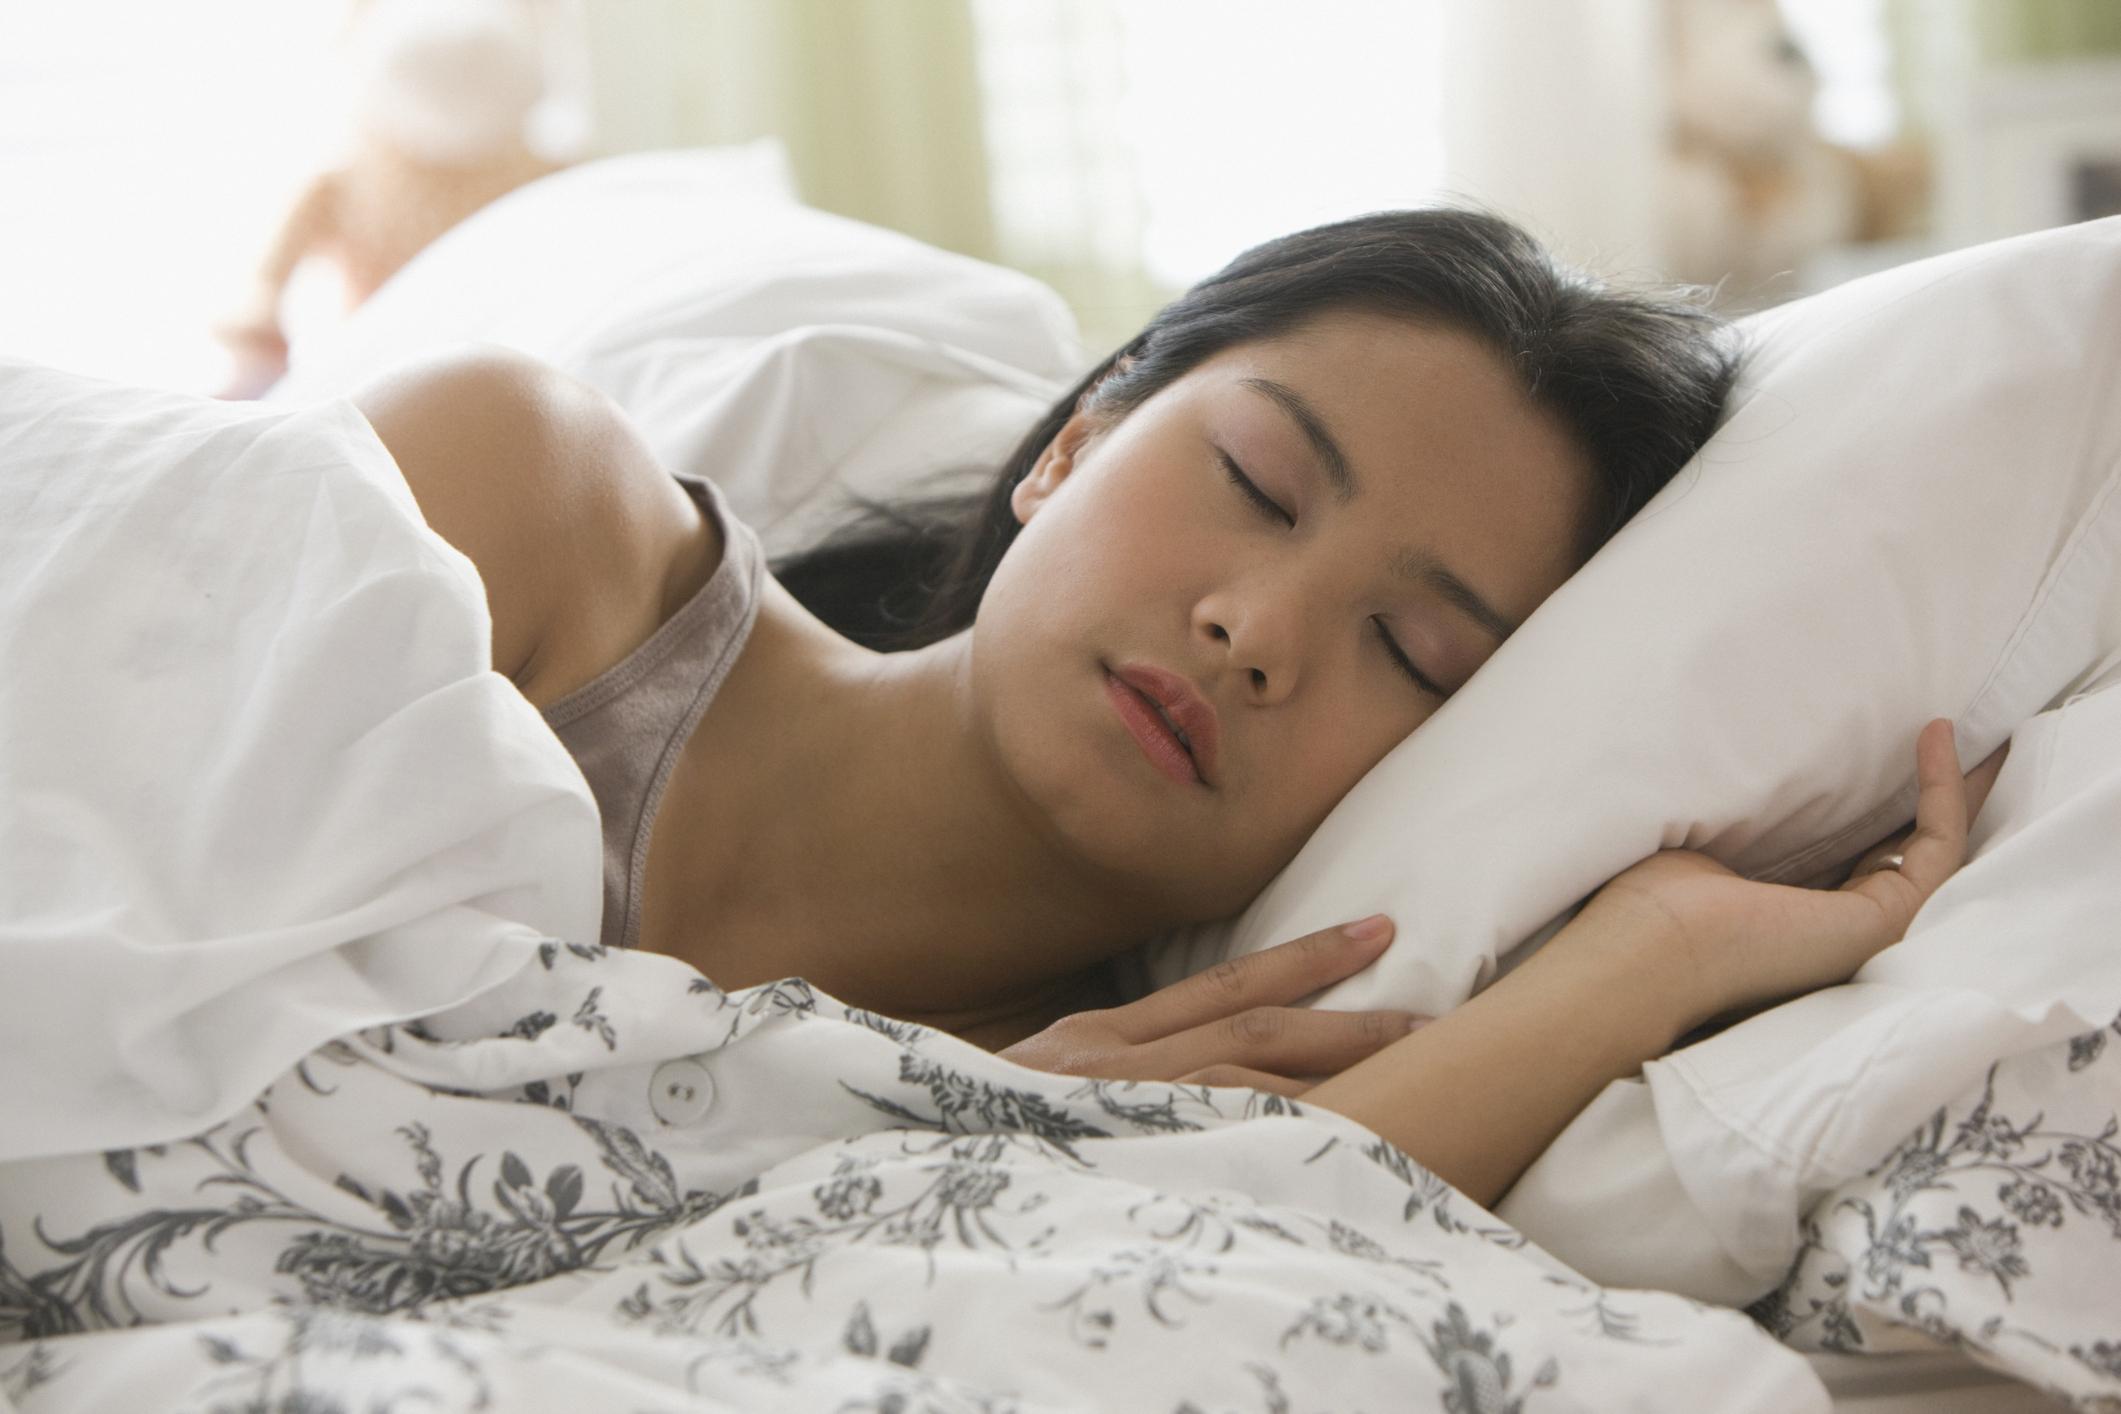 21 week pregnant thai teen heather deep go on jetski and give deepthroat creamthroat throatp - 2 9